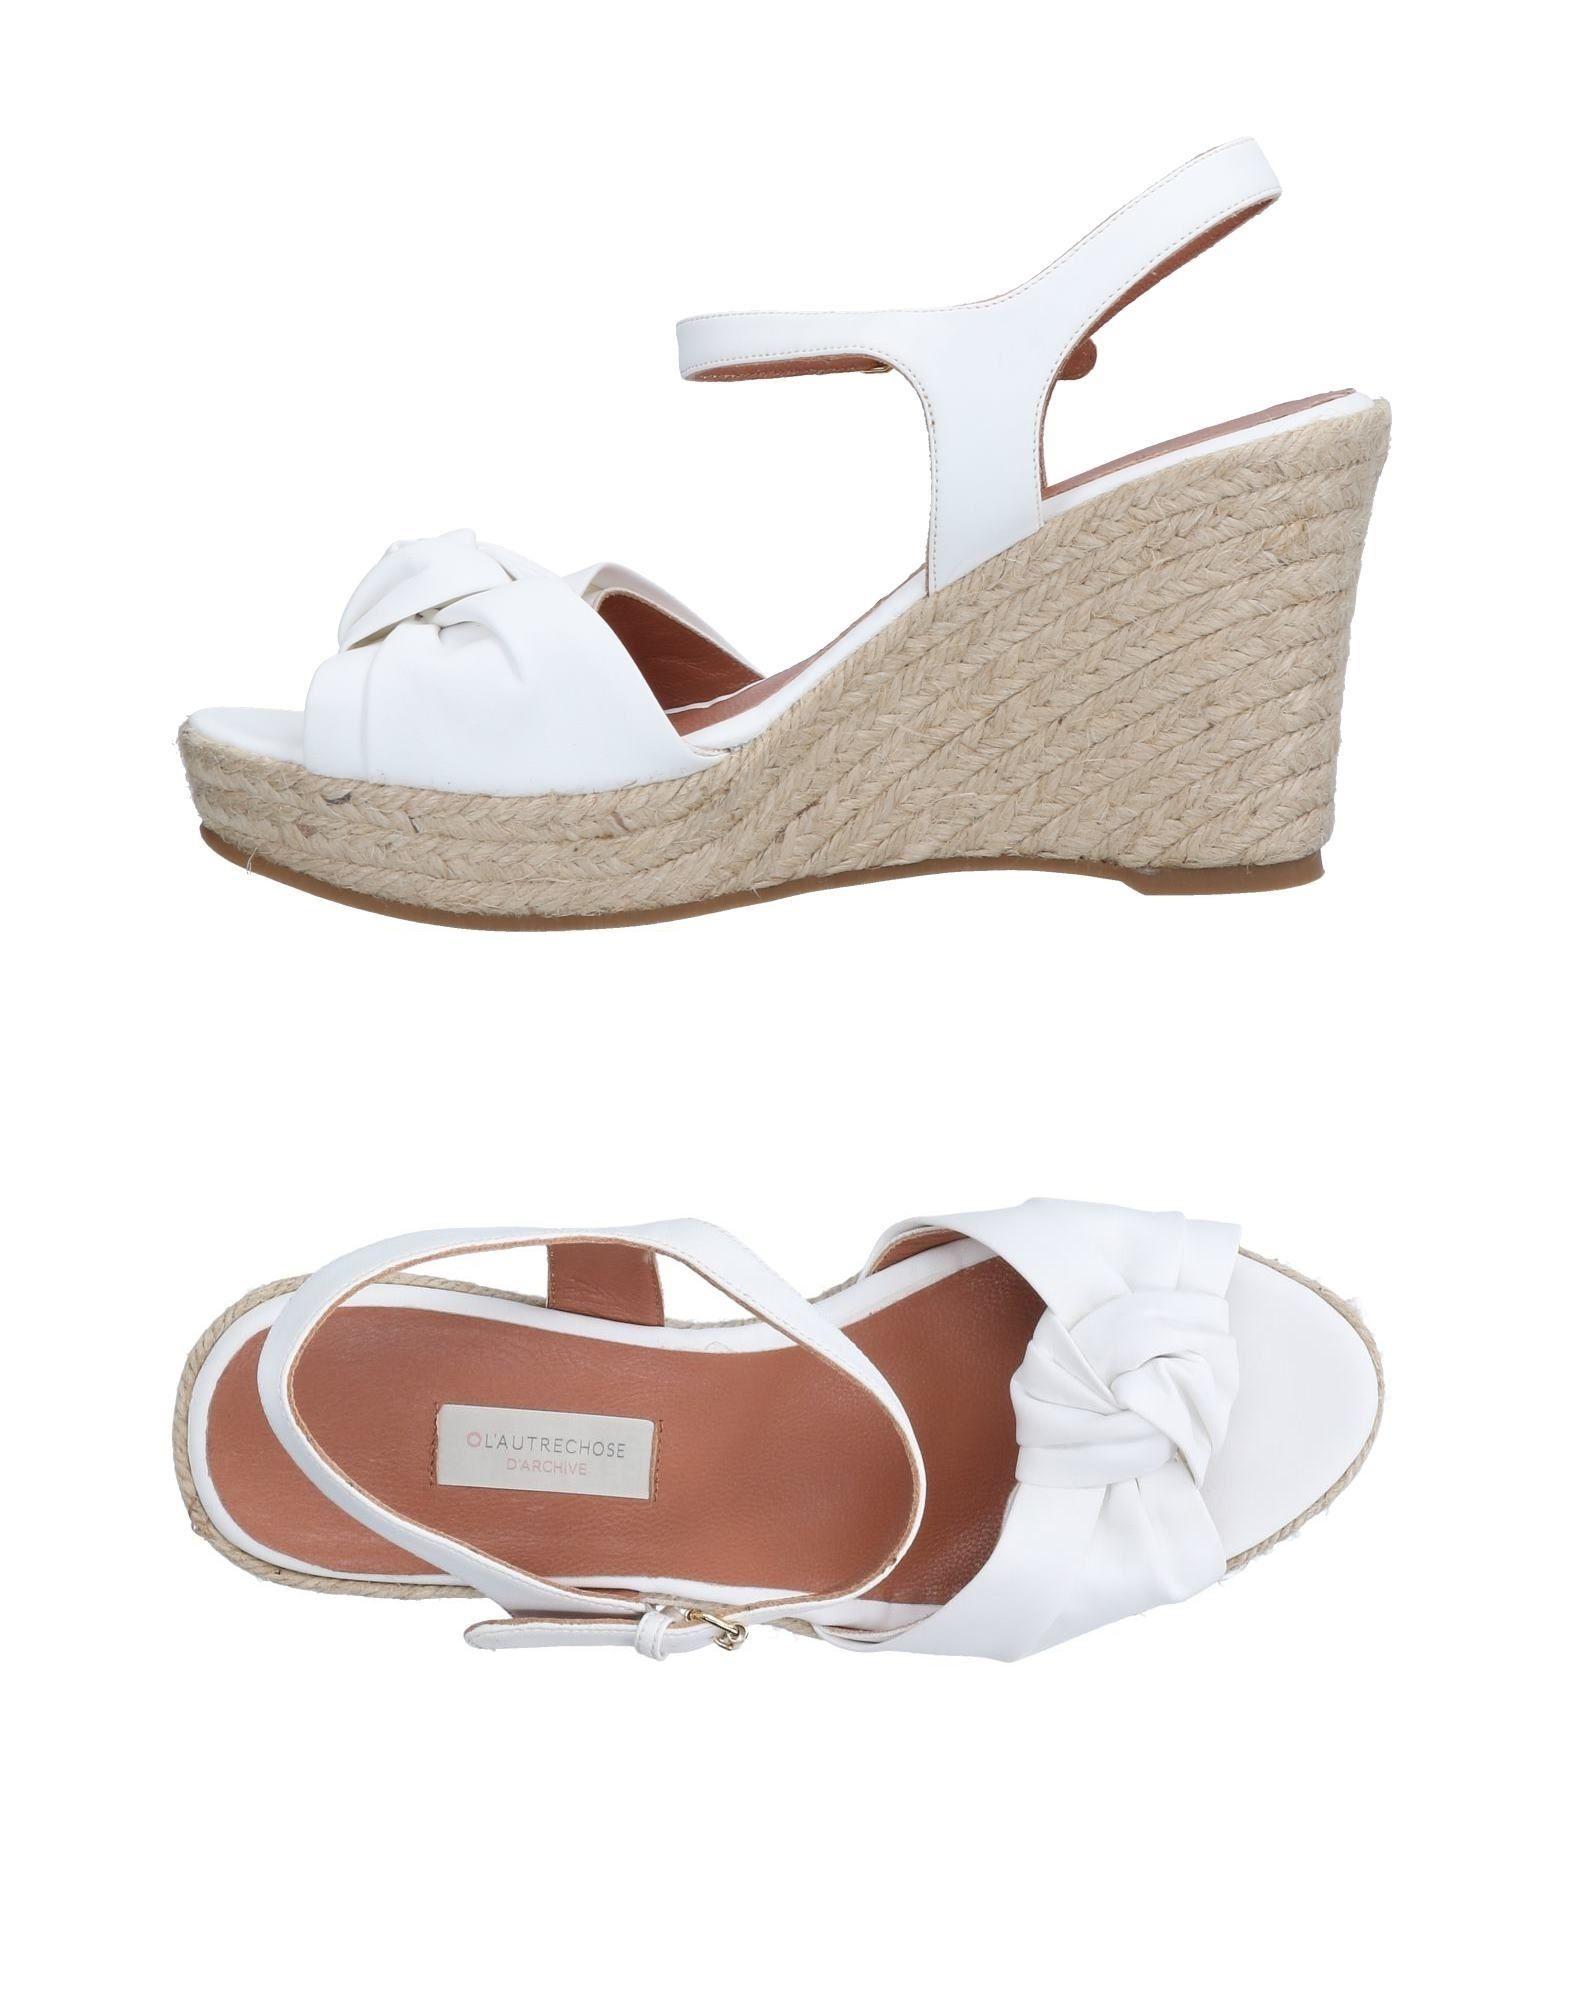 L' Autre Chose Espadrilles Damen  11189189GI Gute Qualität beliebte Schuhe